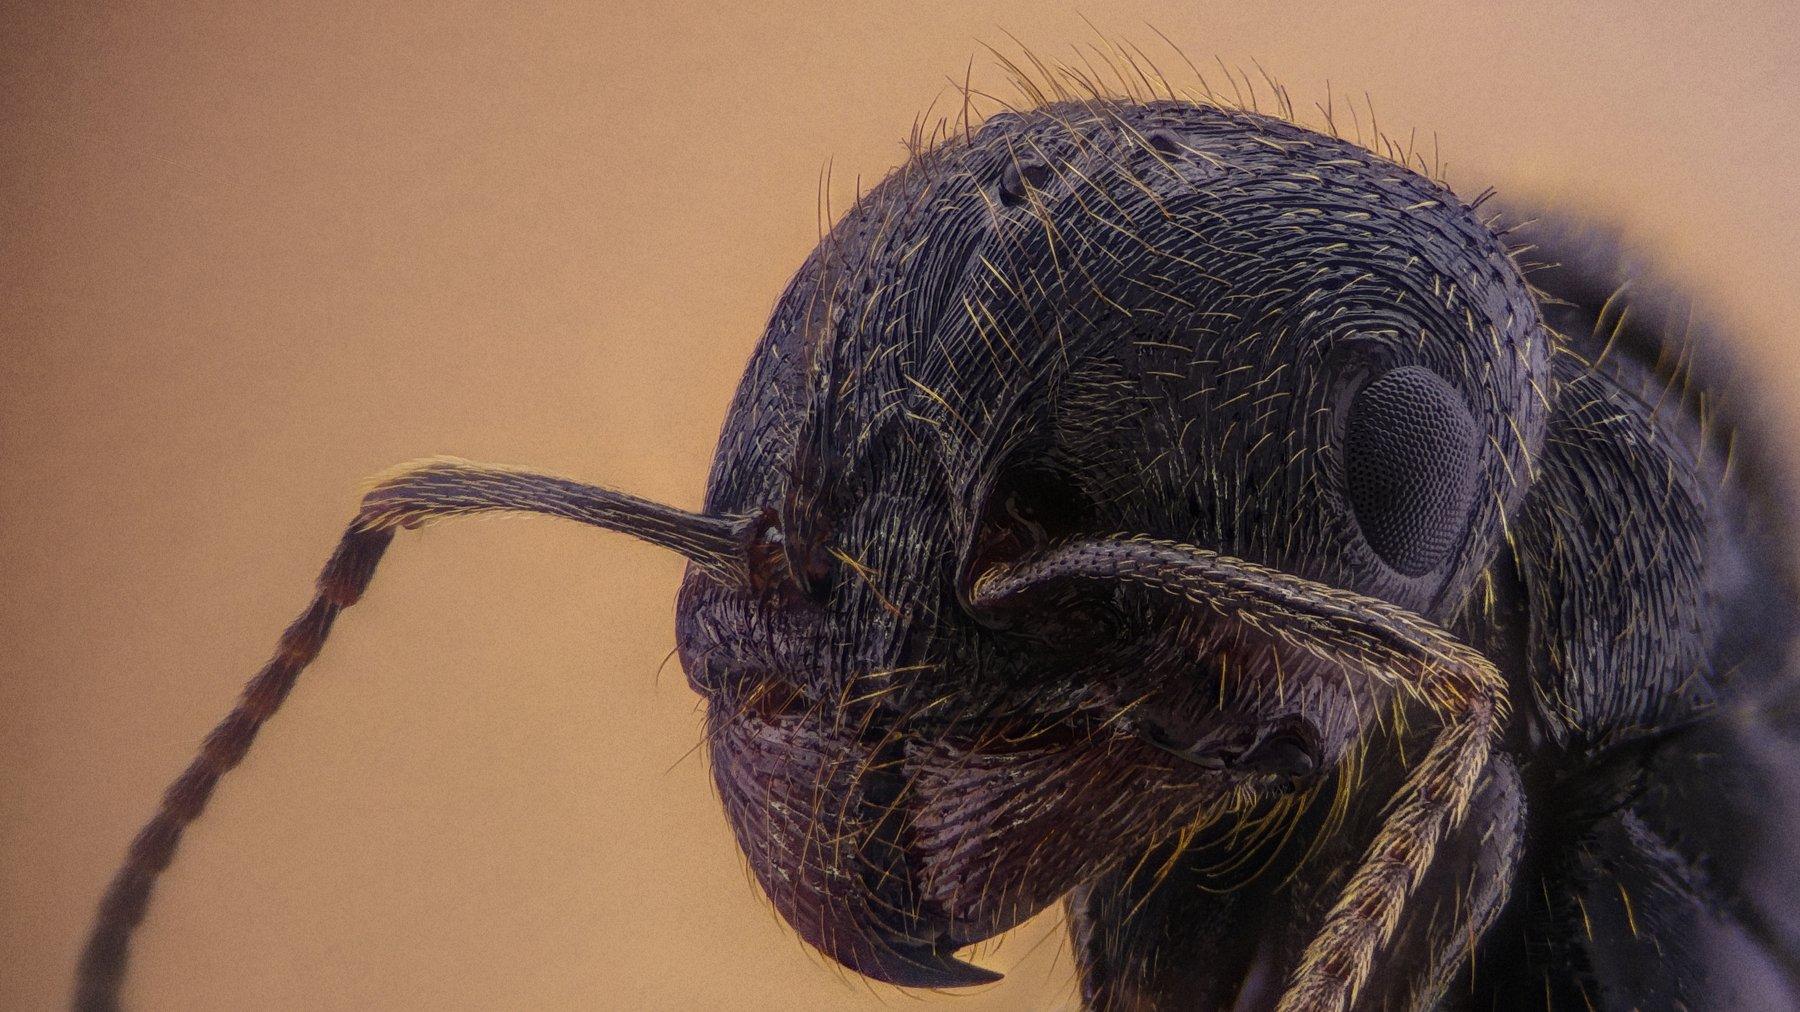 ceclii,macro,lgg4, extremmacro, муравей, мравка, макро, Цветан Ганев